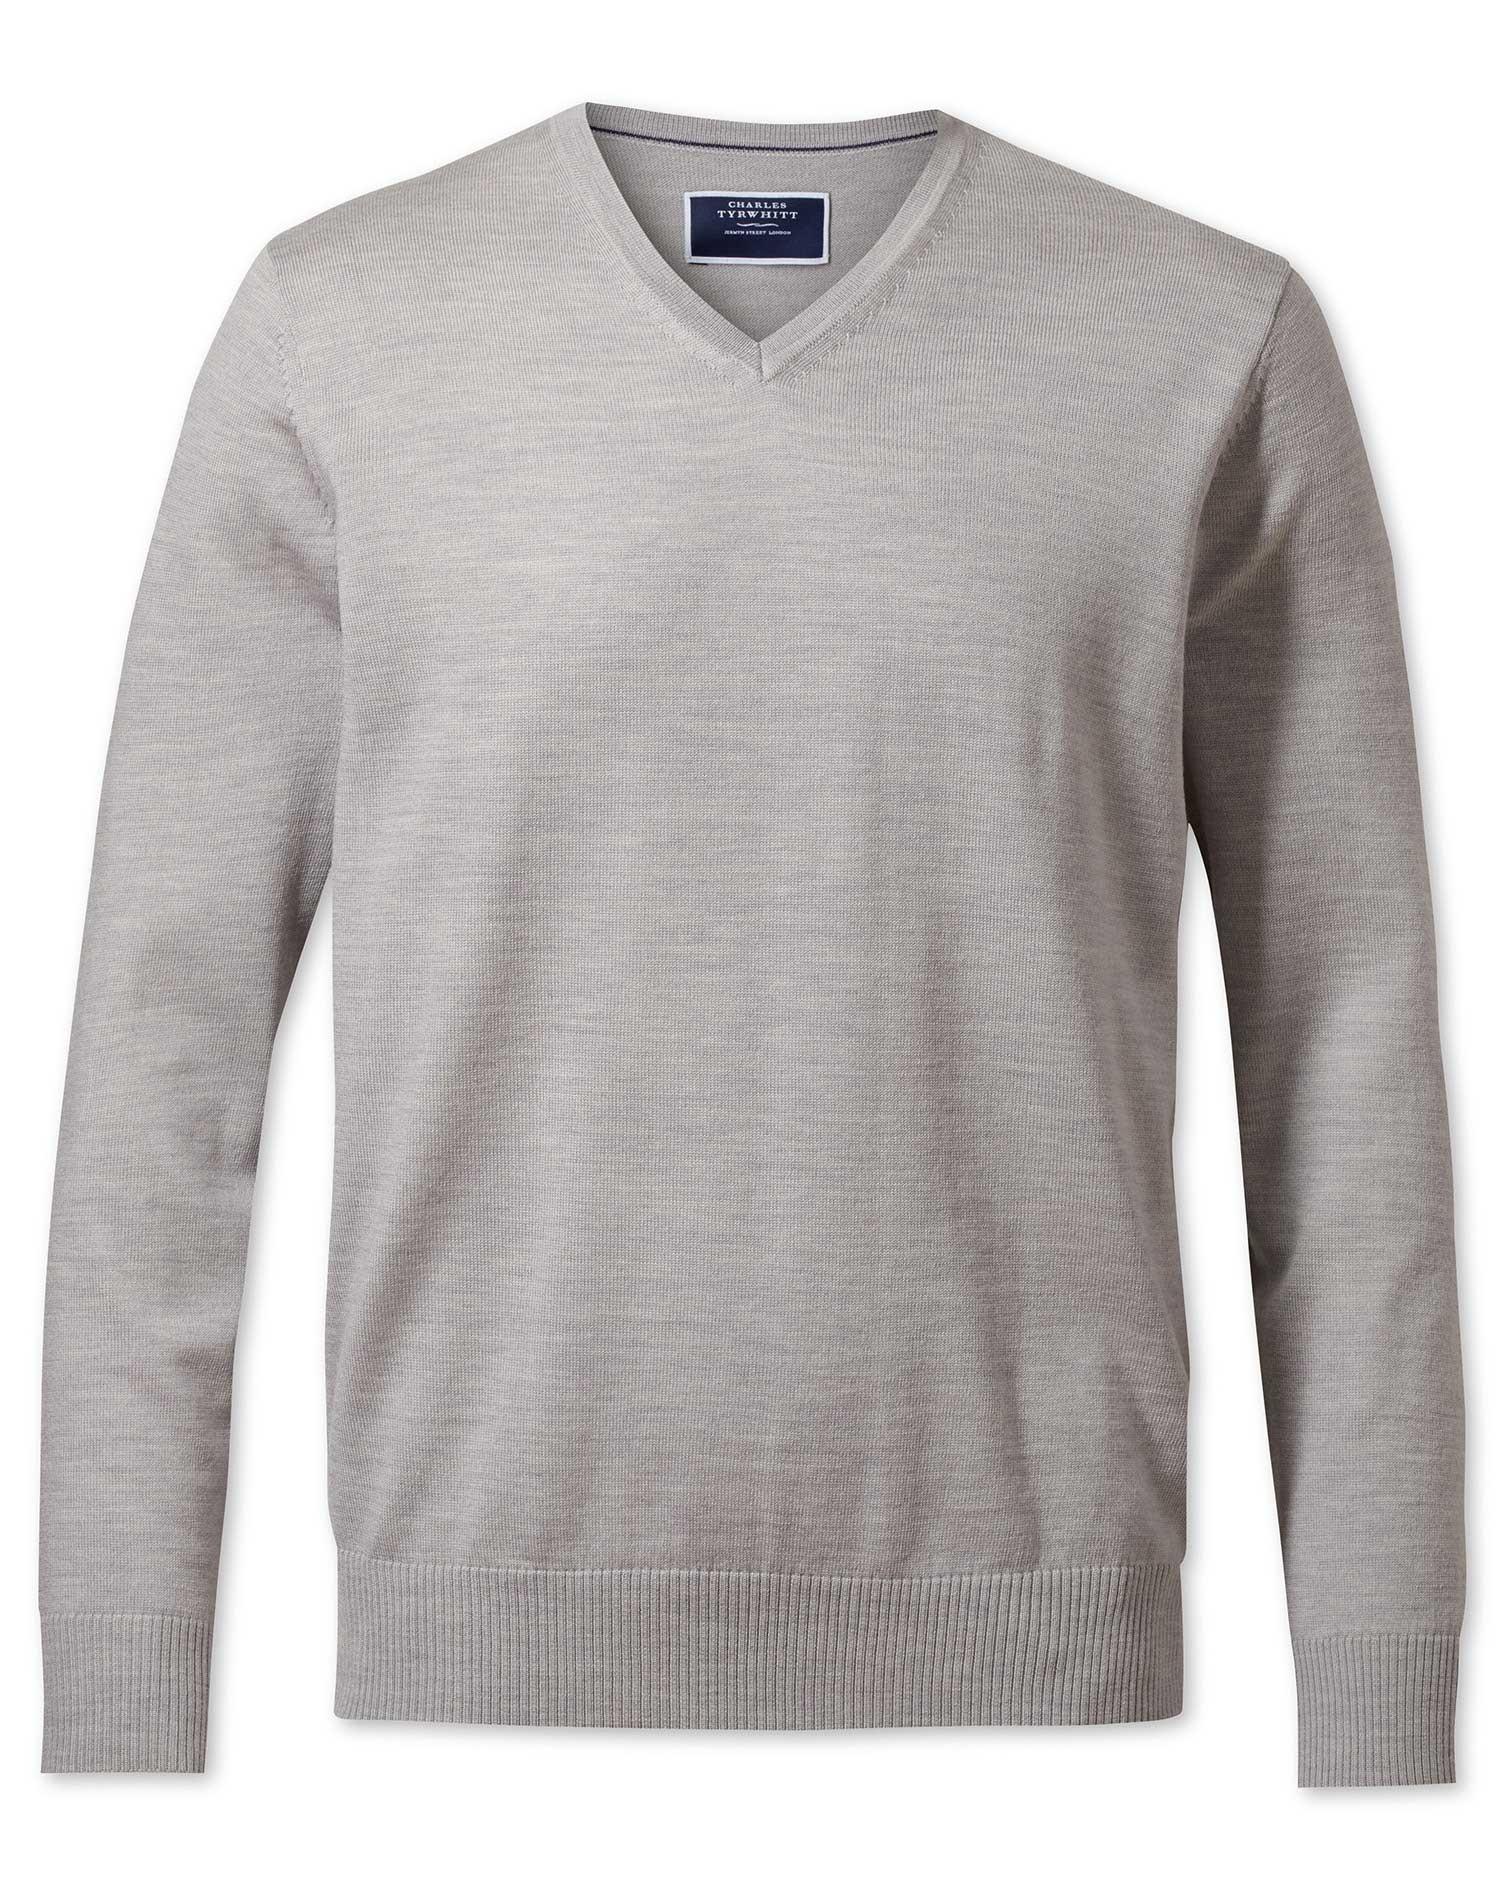 Silver Merino Wool V-Neck Jumper Size Large by Charles Tyrwhitt